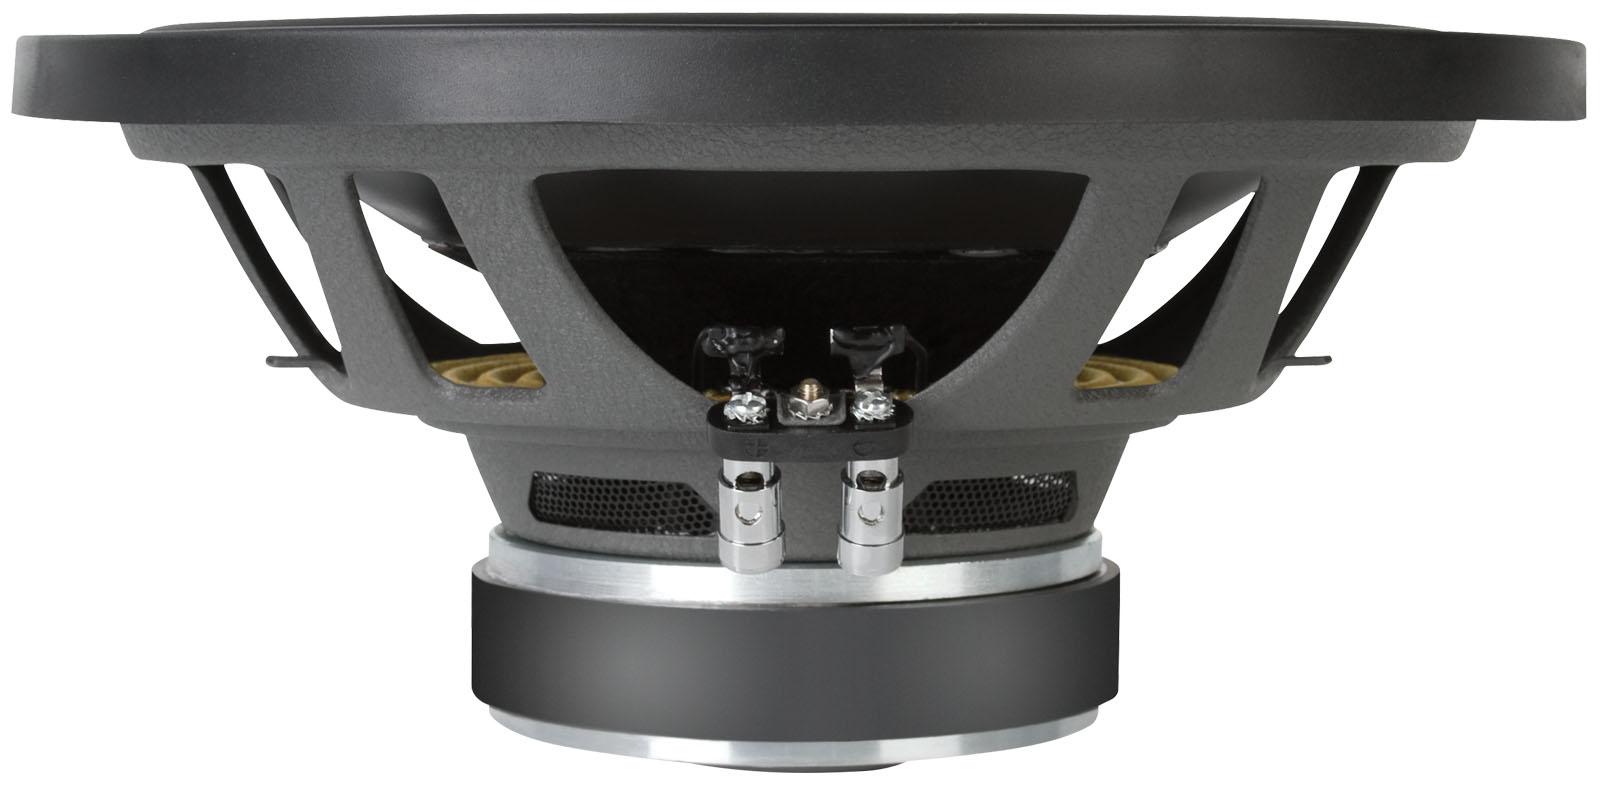 Rts12 04 Roadthunder 12 250 Watt Rms Car Audio Subwoofer Mtx Mb Quart Premium Series Amplifiers Digital System Serious About Sound